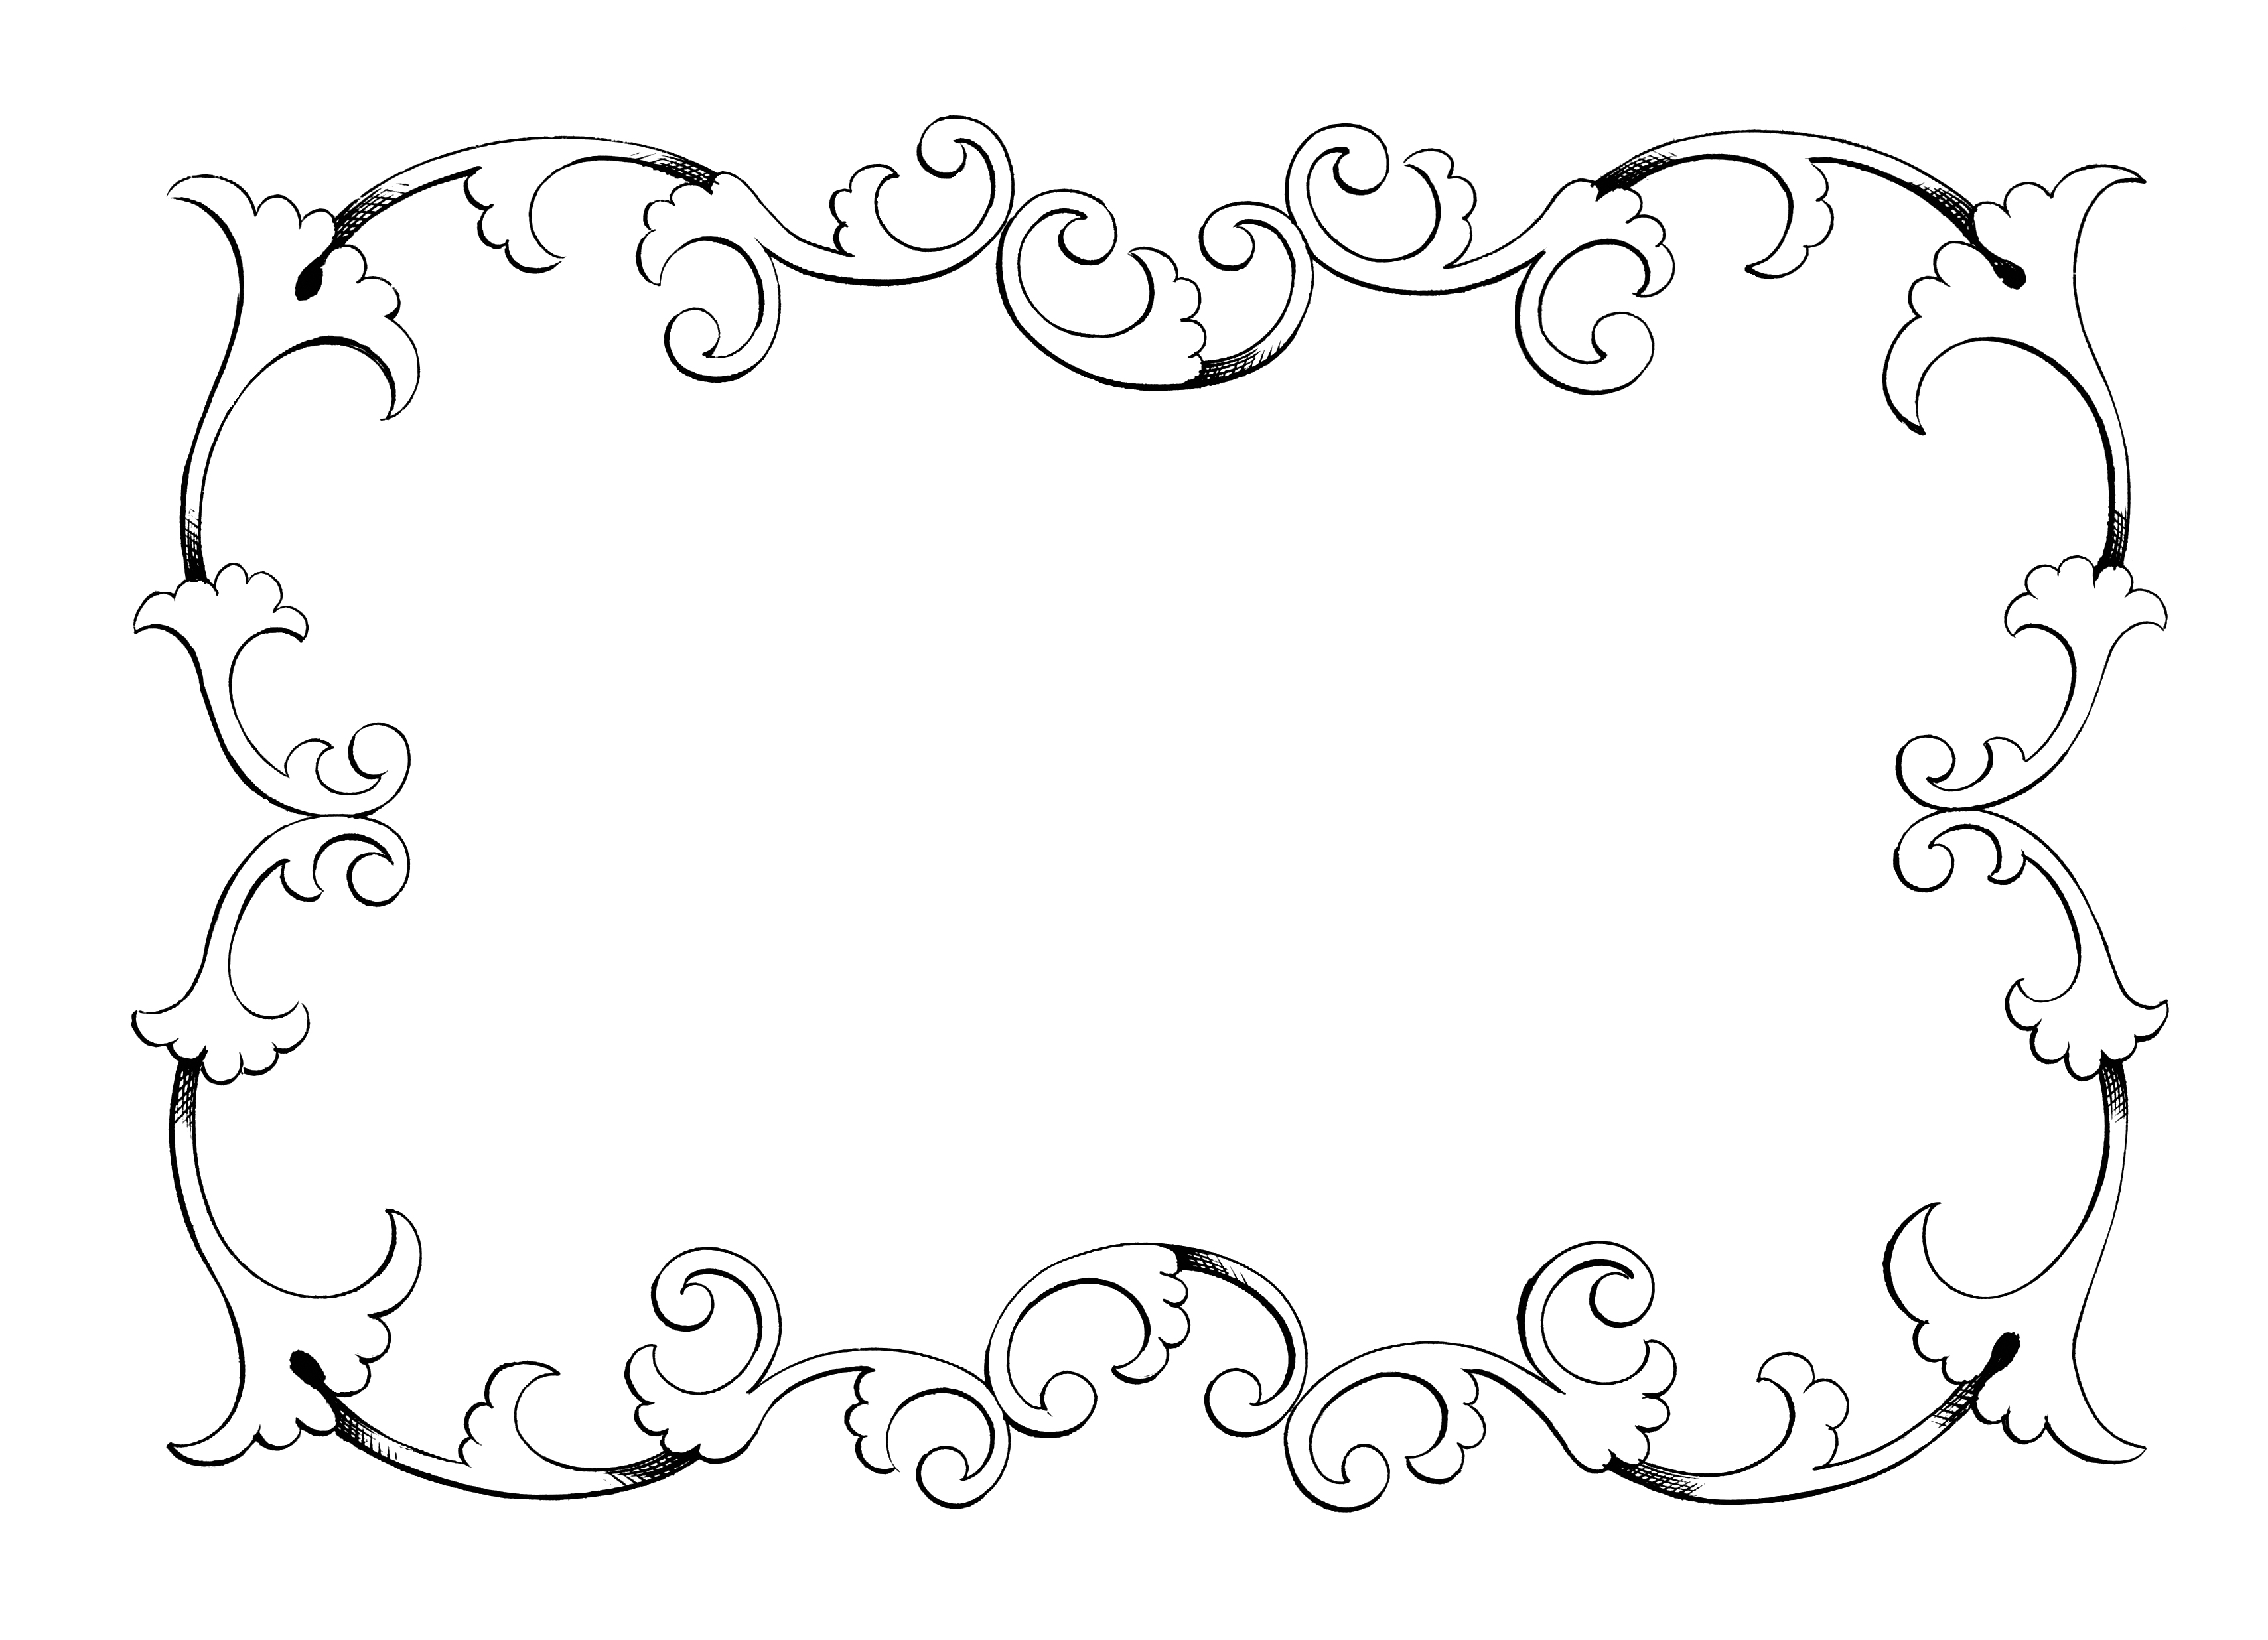 Clip Art Frames Free - ClipartFest-Clip art frames free - ClipartFest-4